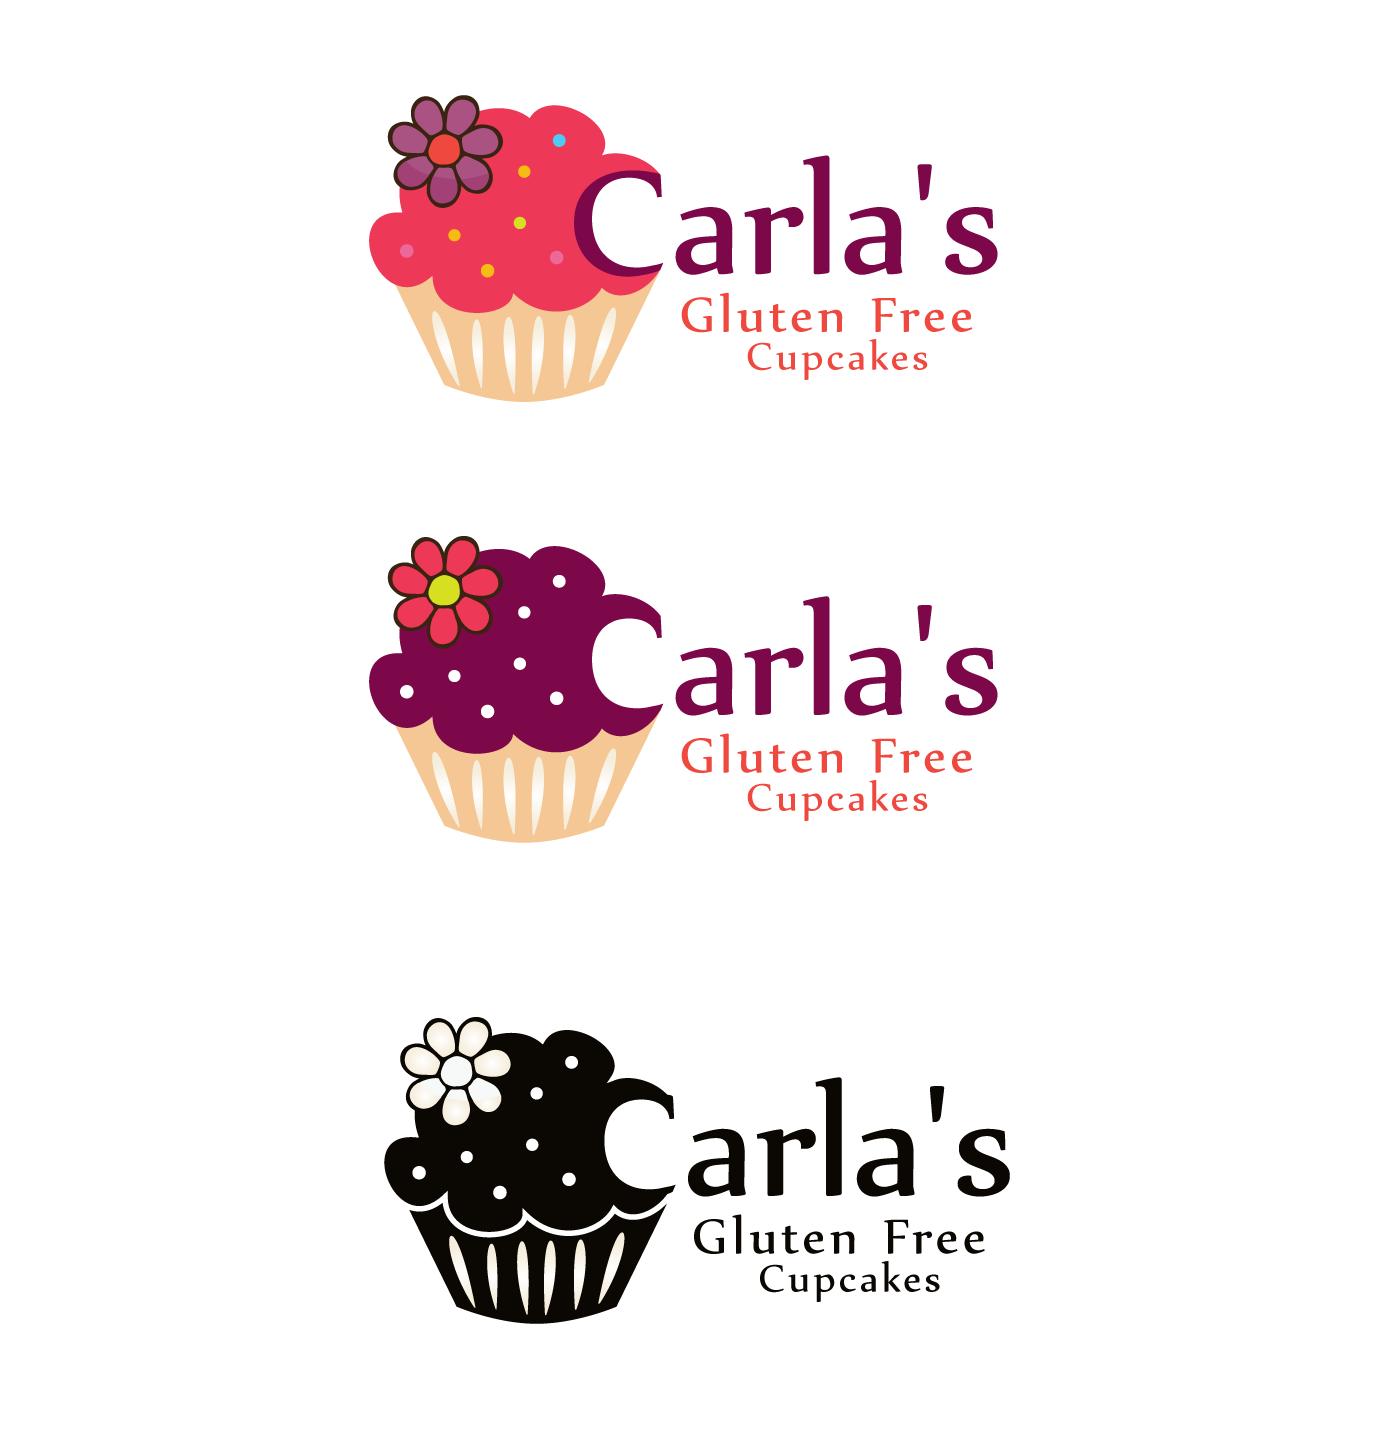 Business Logo Design Fur Carla S Gluten Free Cupcakes Von Dan86